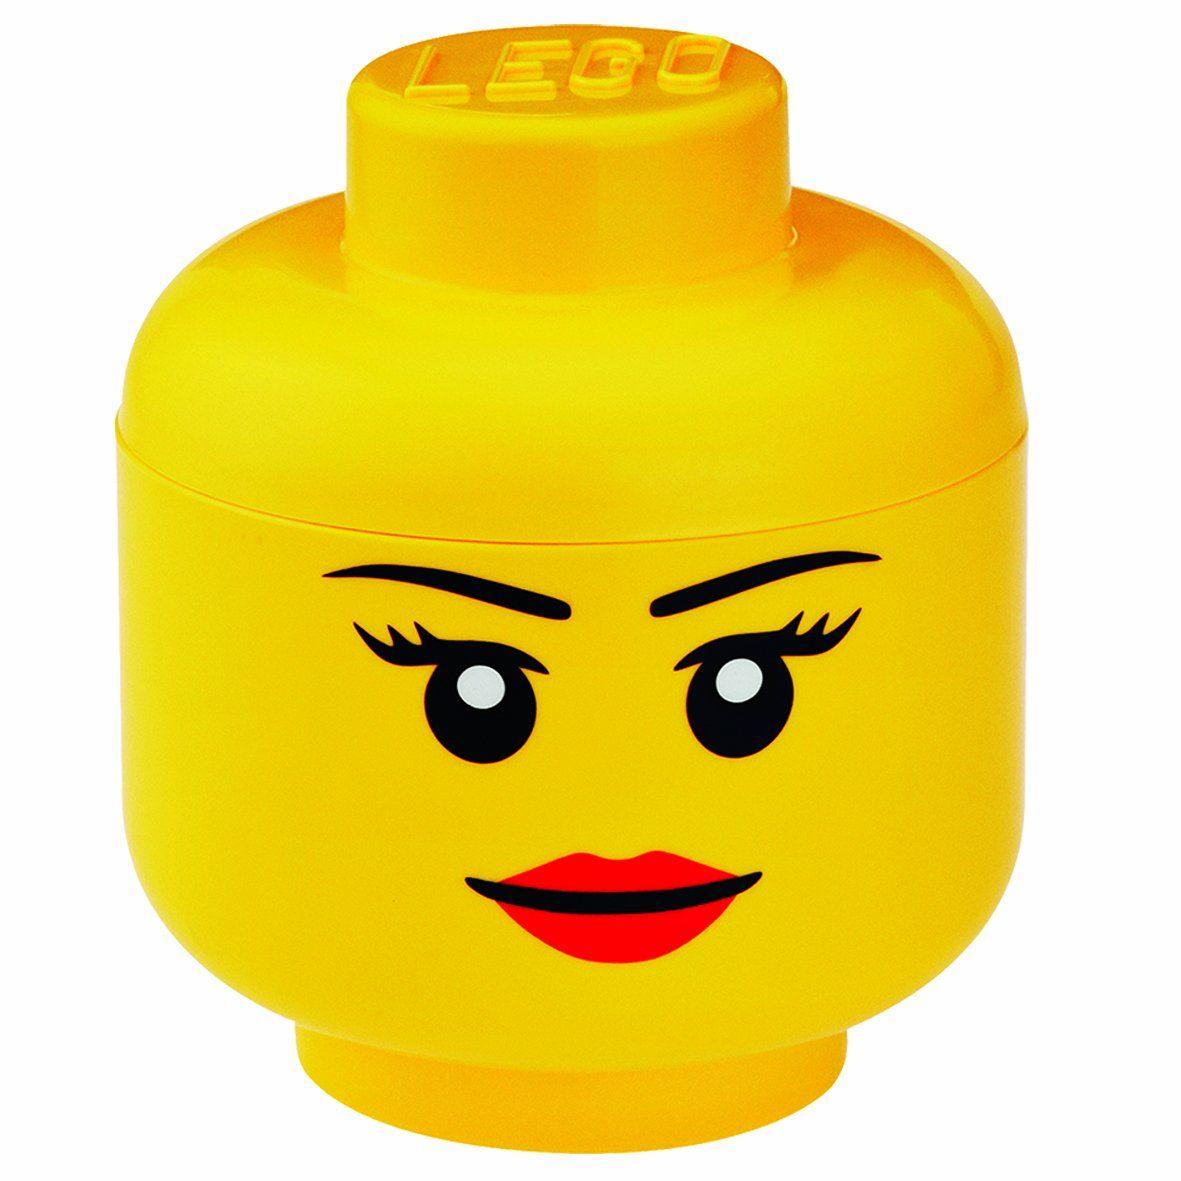 LEGO Licensed Collection 40321222 - Storage head, L, big girls